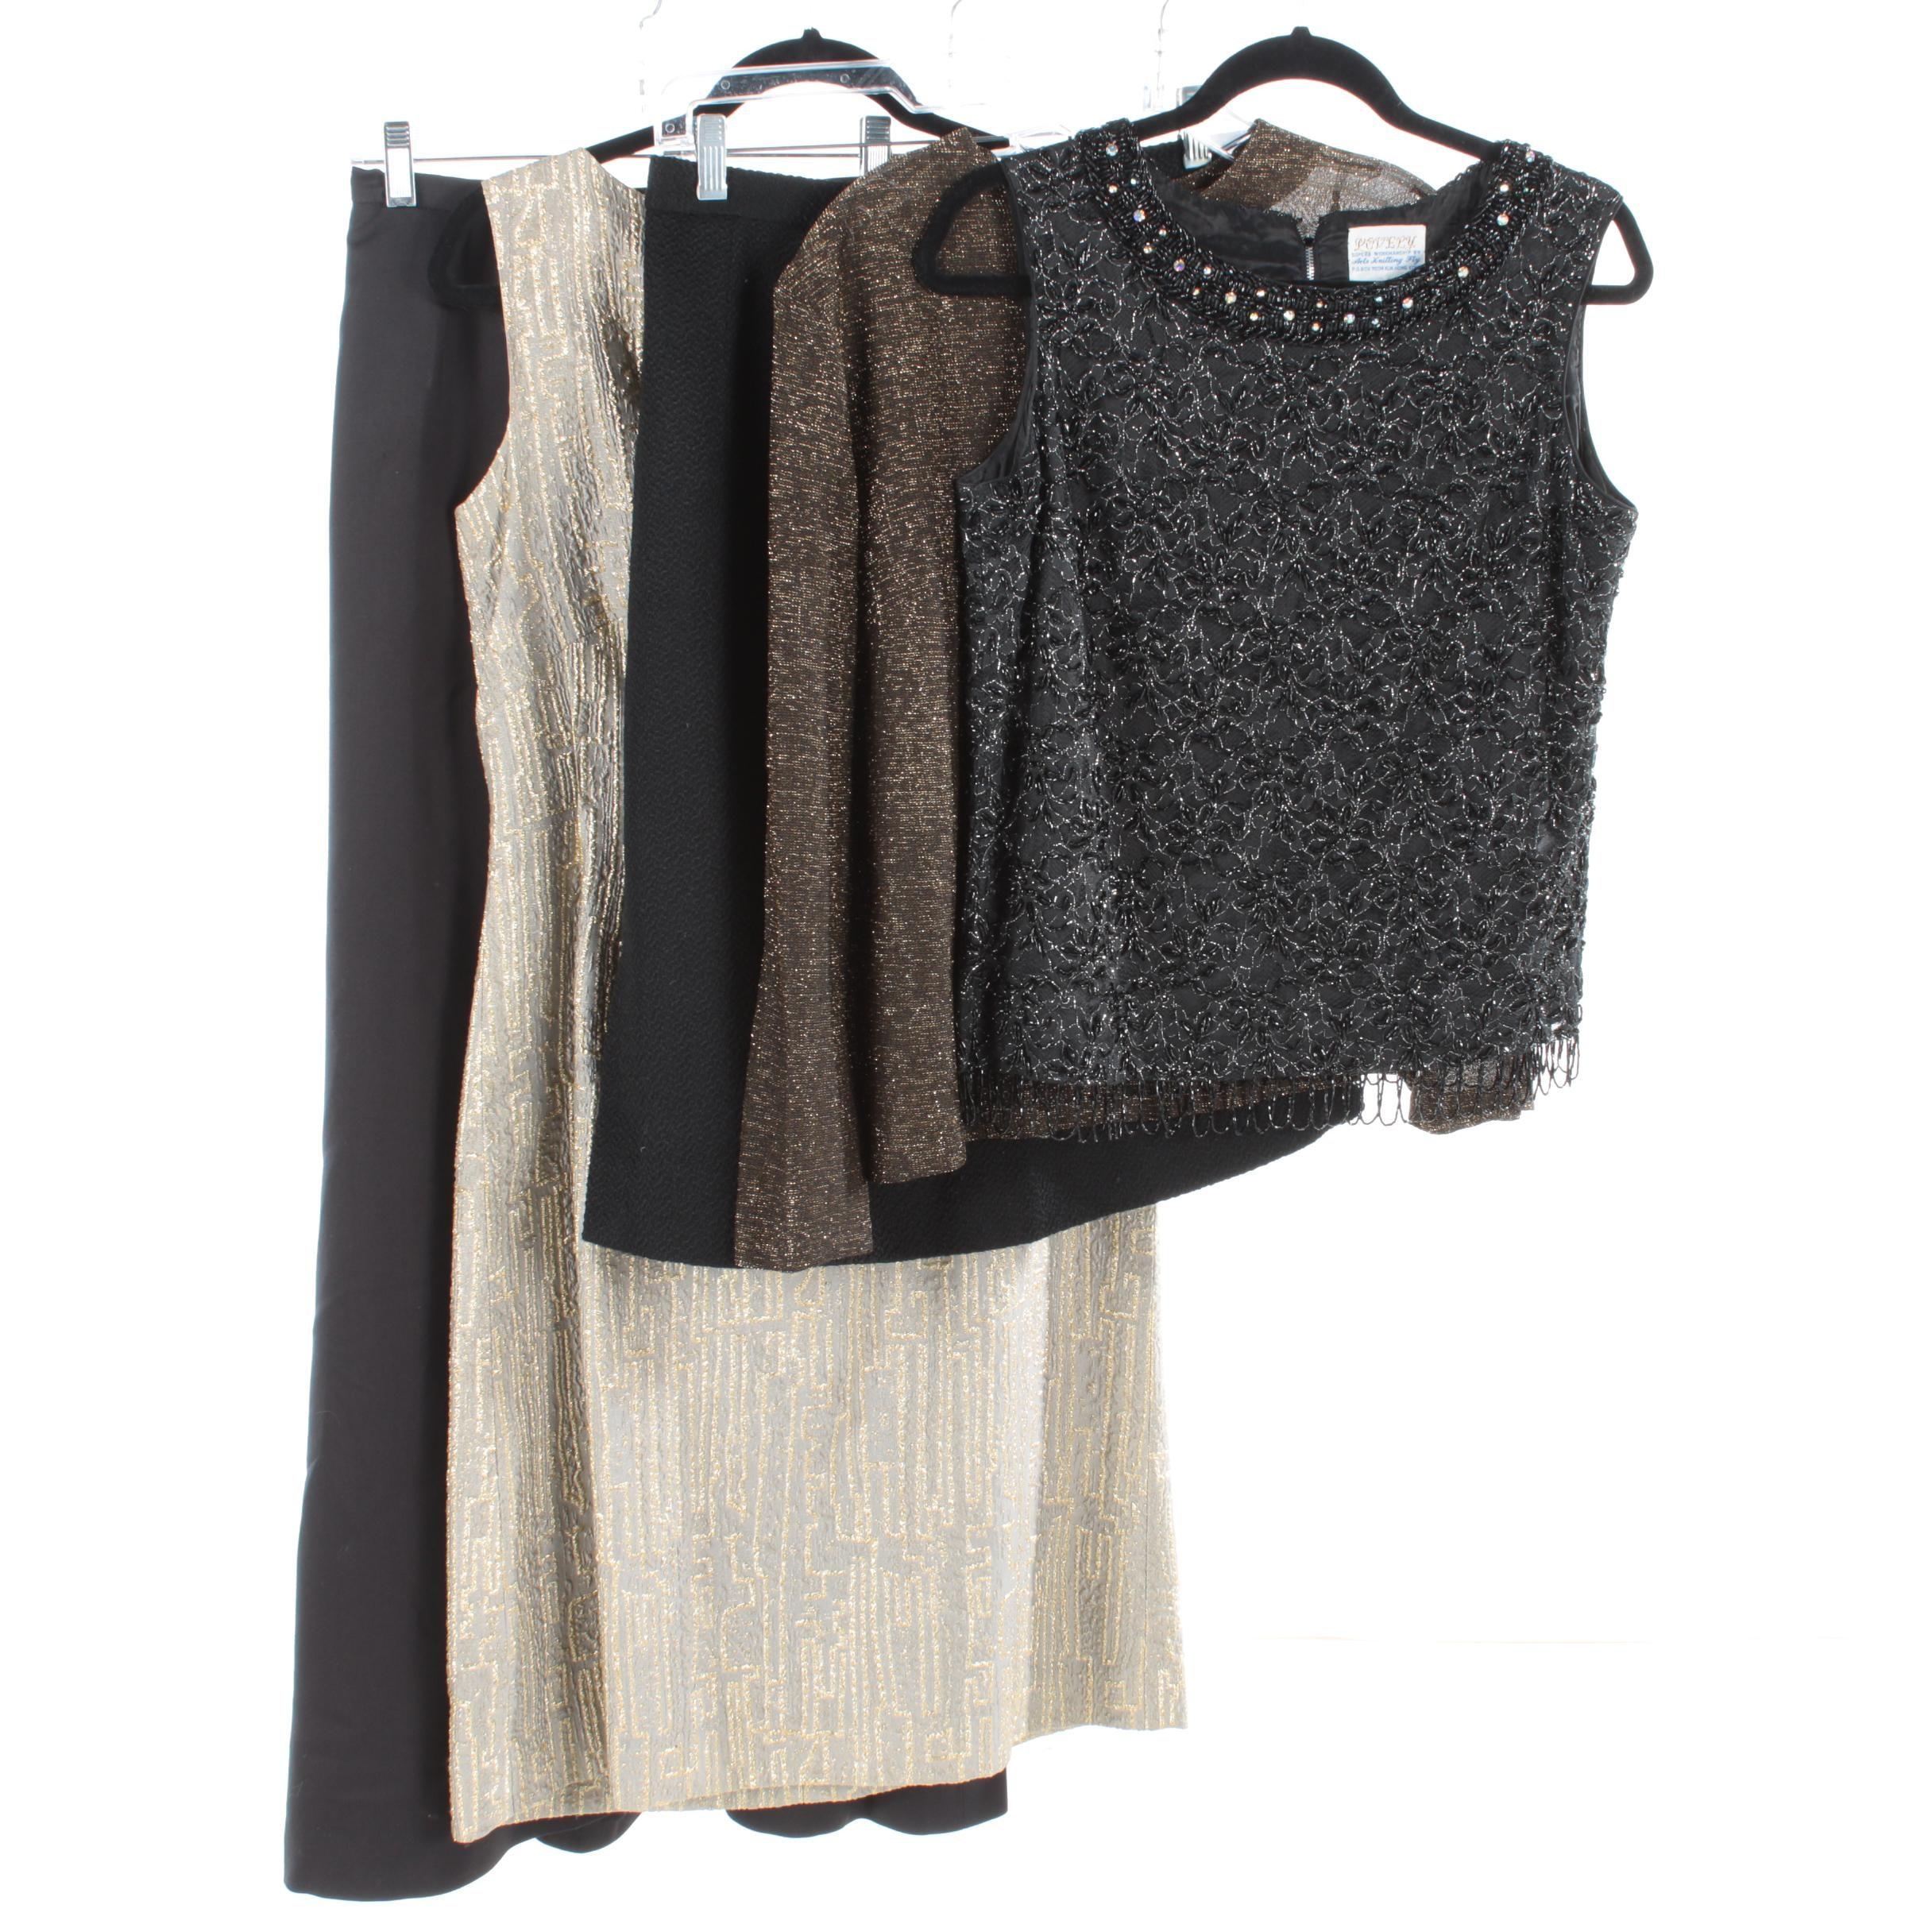 Women's Occasional Wear Including Modell Metallic Sheath Dress